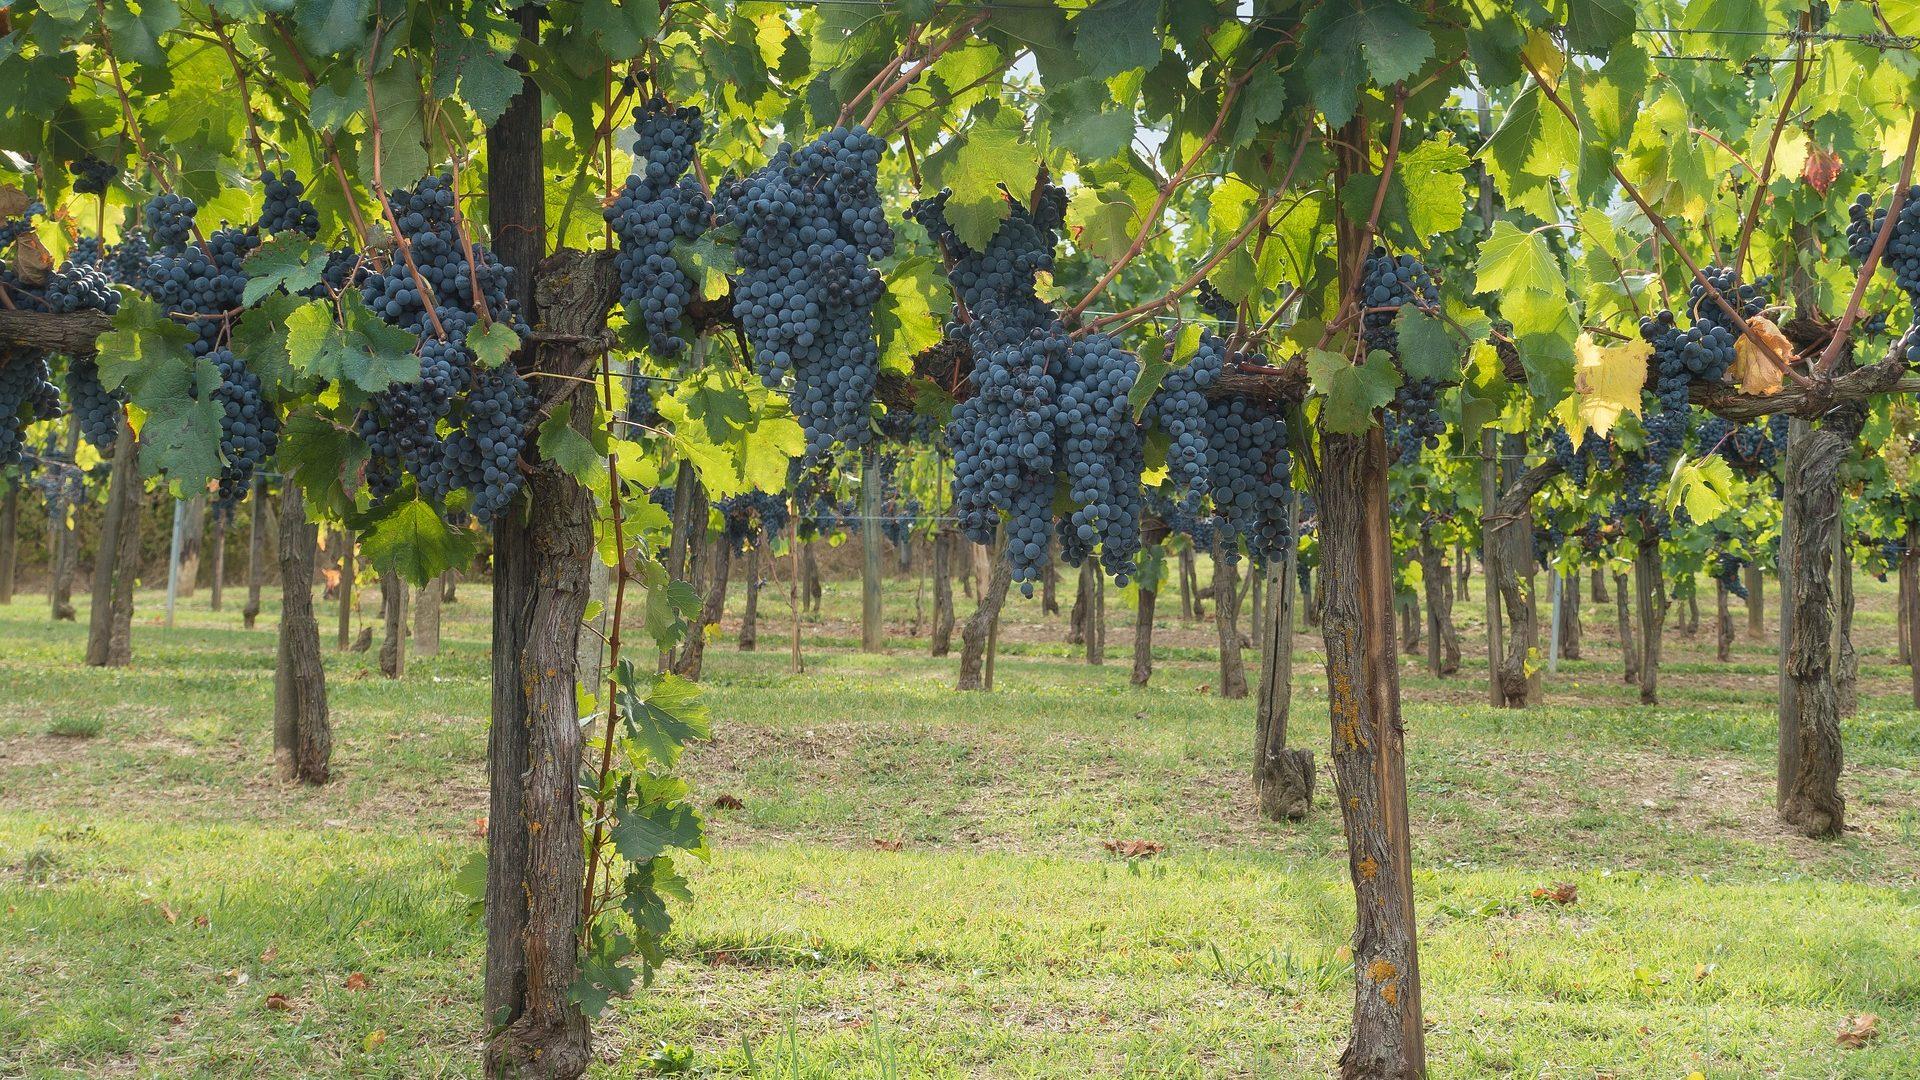 winegrowing-972948_1920